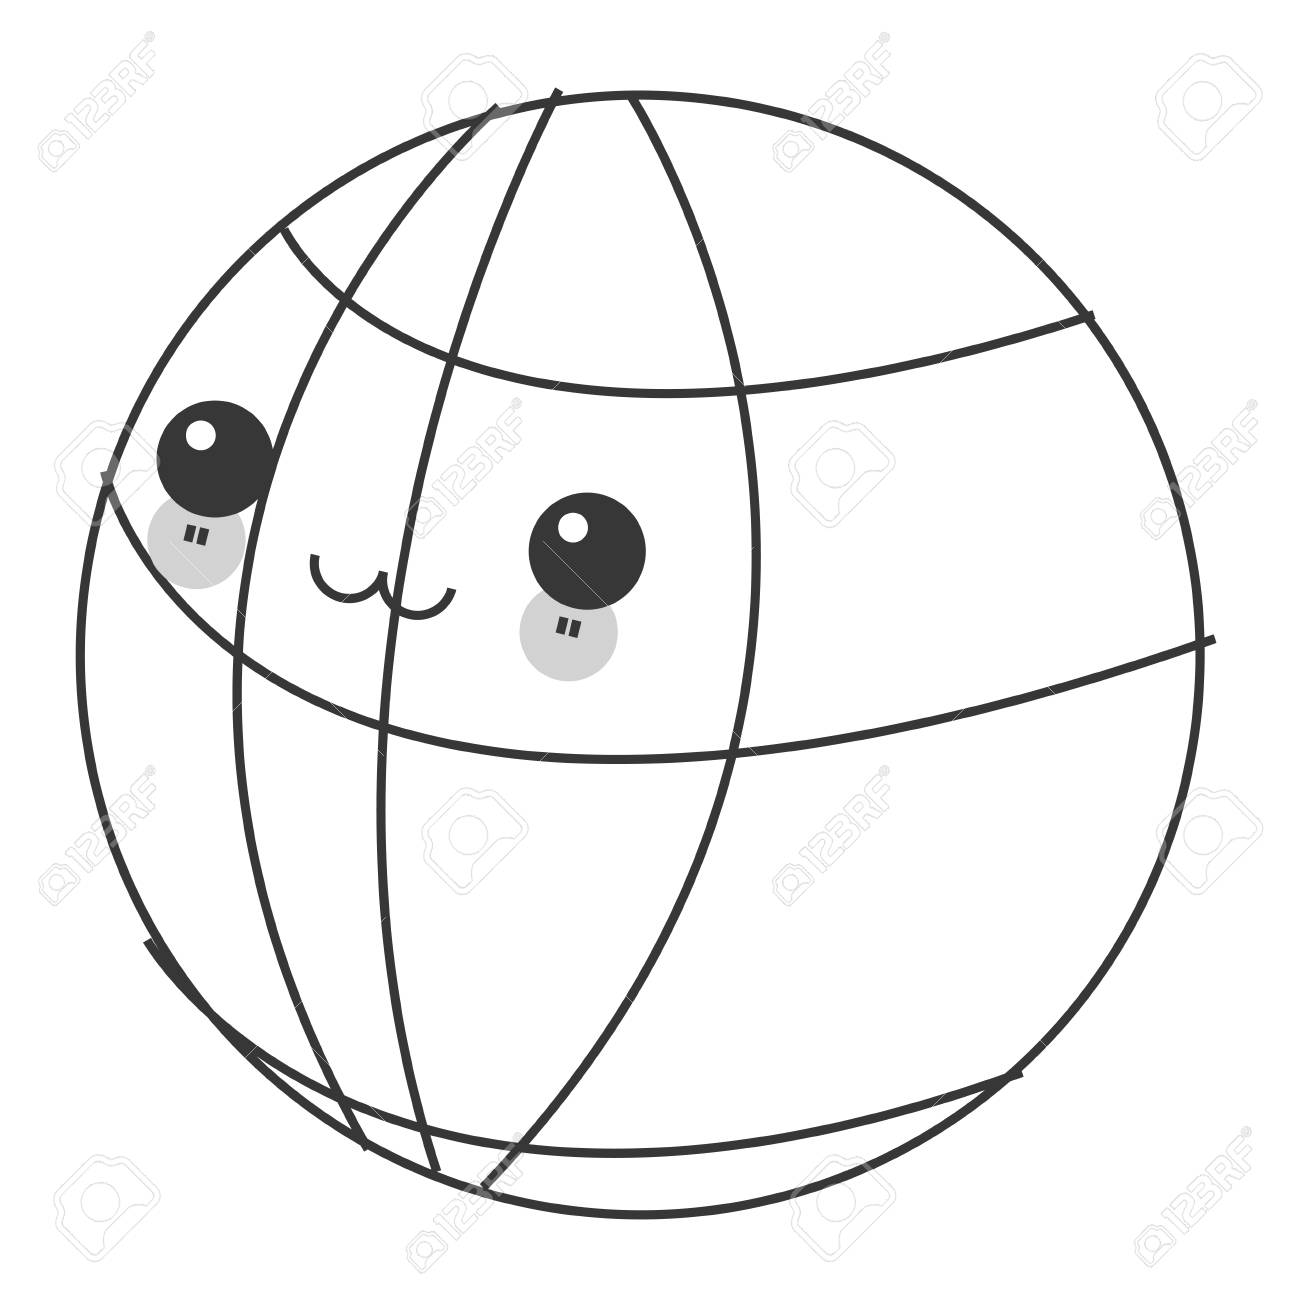 hight resolution of flat design kawaii earth globe diagram icon vector illustration stock vector 60679204